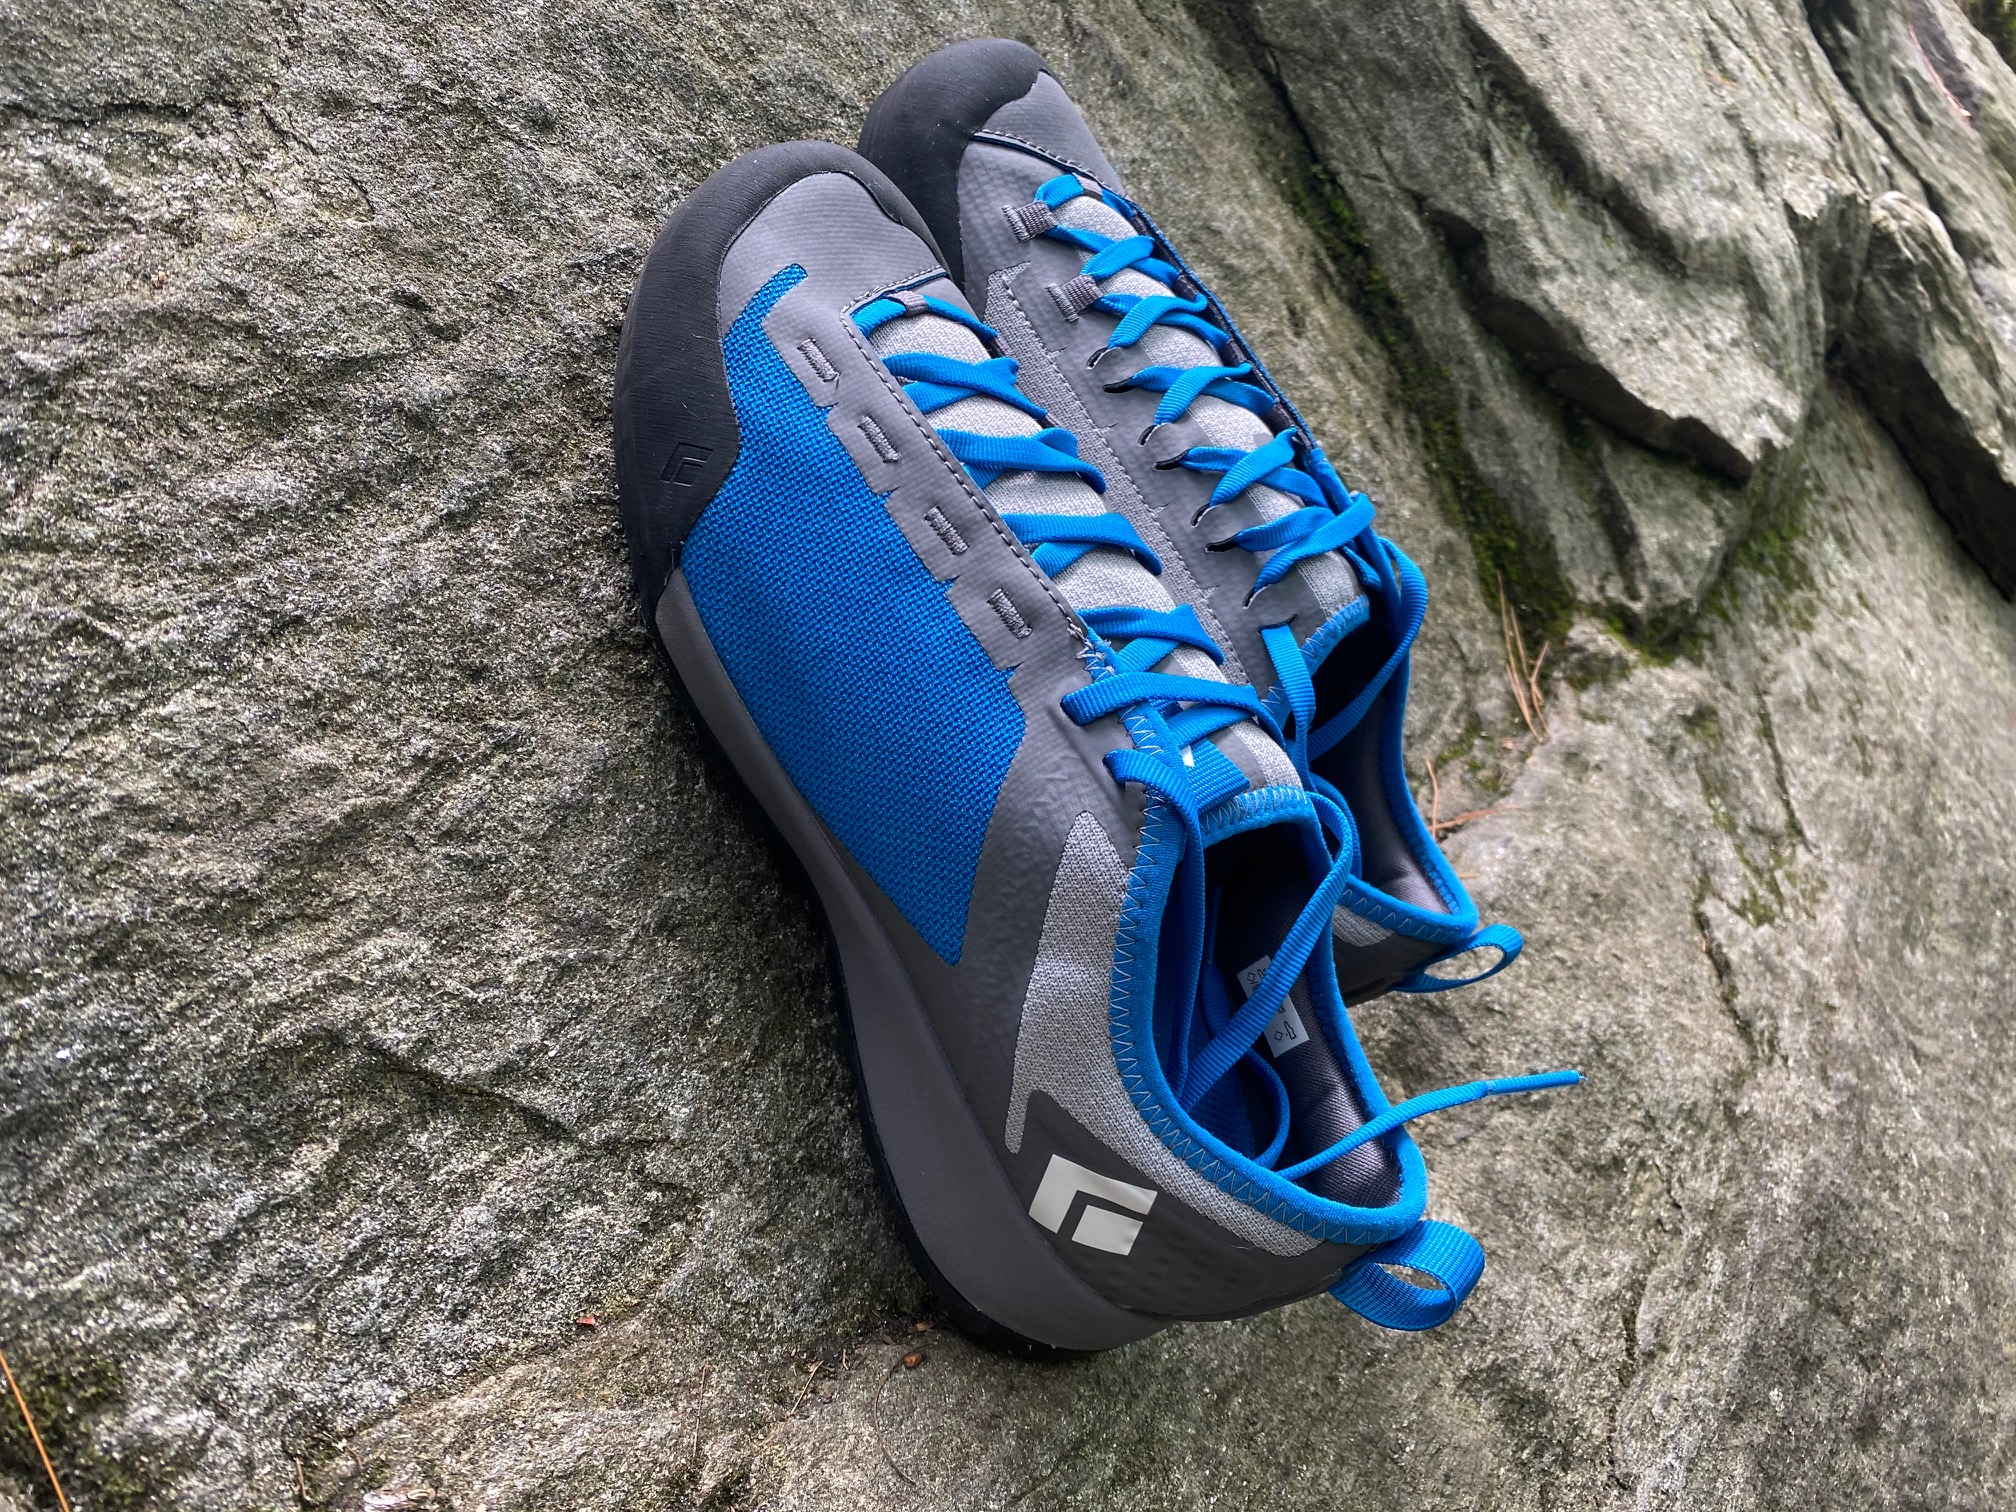 Black Diamond Fuel Approach Shoes Review